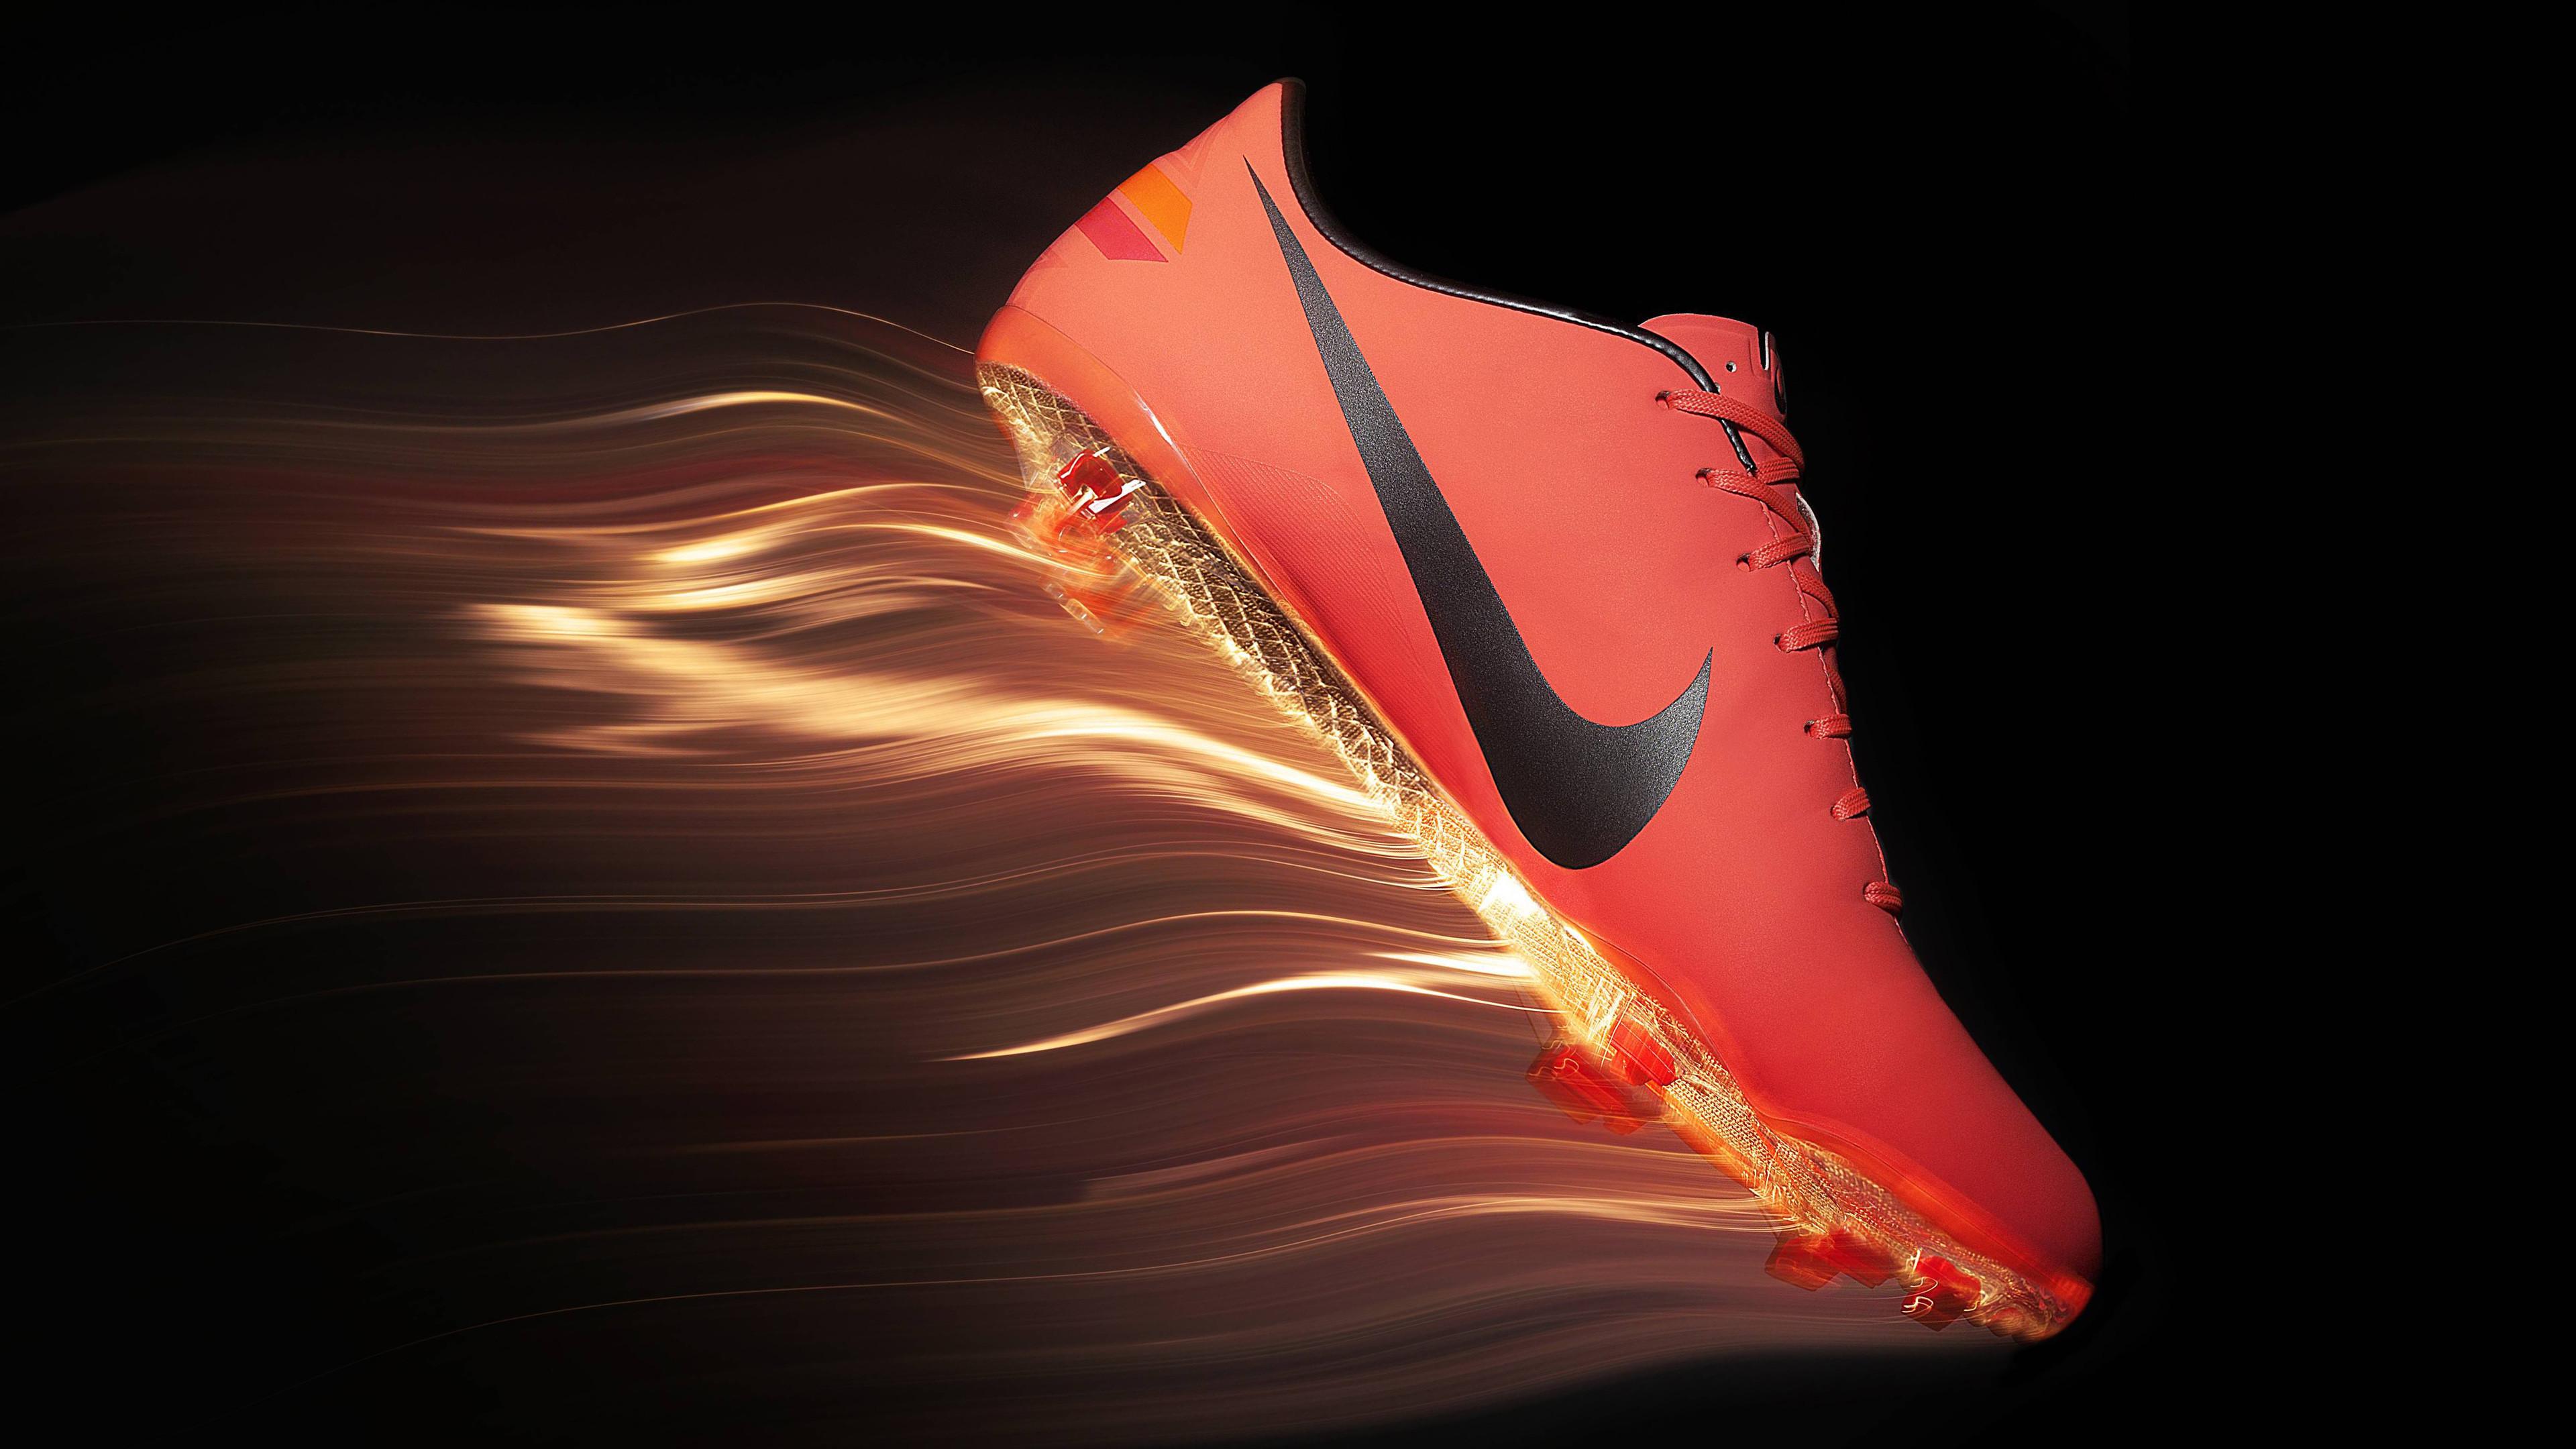 Res: 3840x2160, 2560x1440 Nike Wallpaper High Quality Resolution